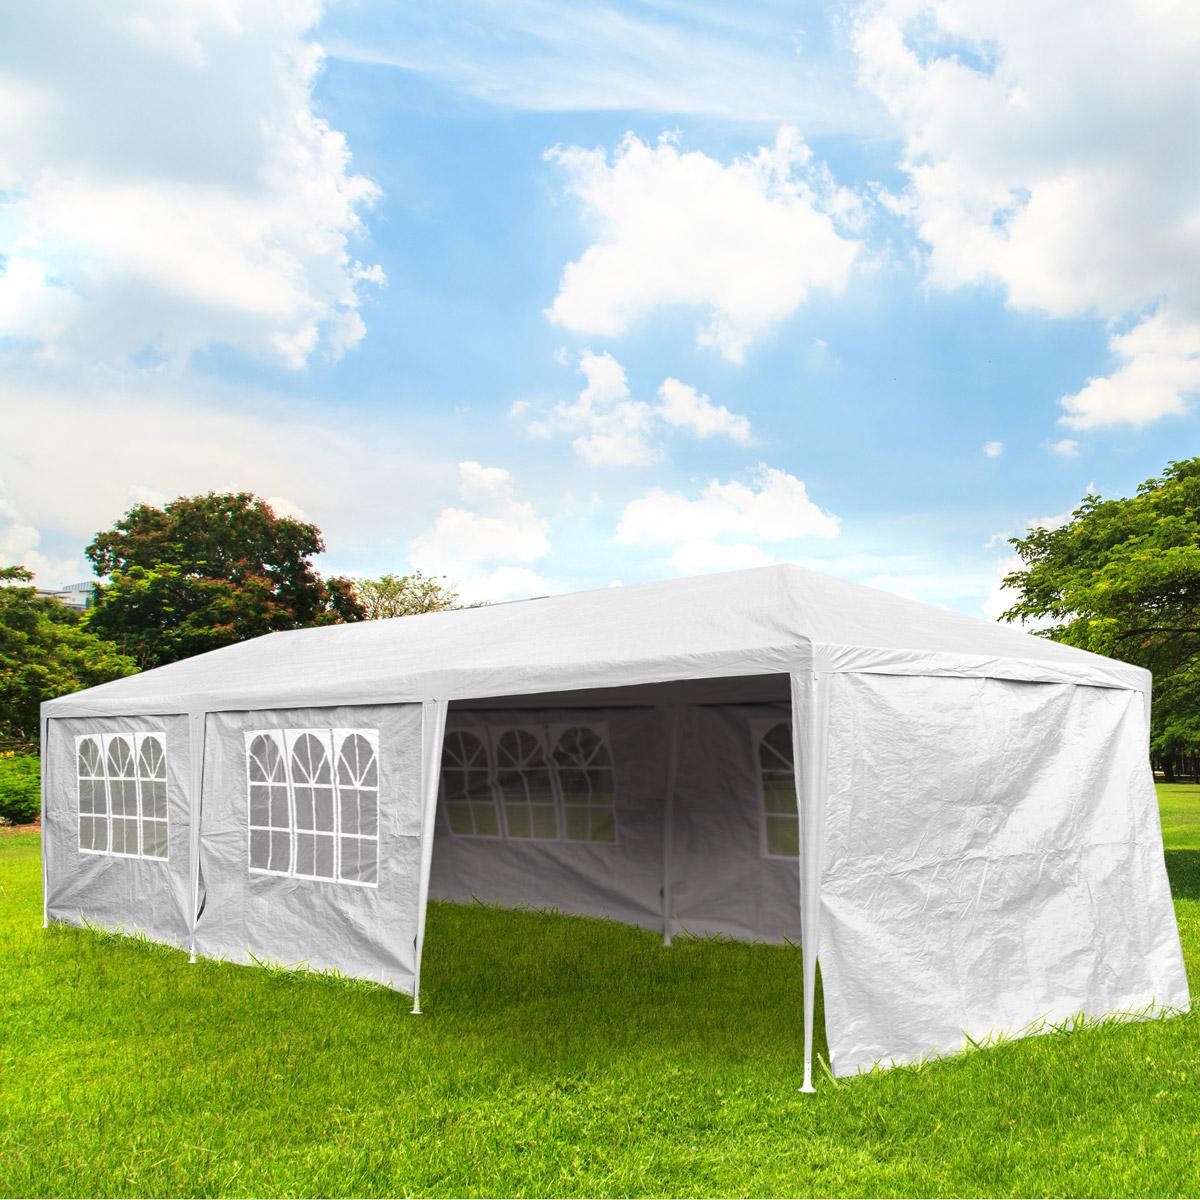 Stunning Tente De Jardin A Vendre Contemporary - House Design ...